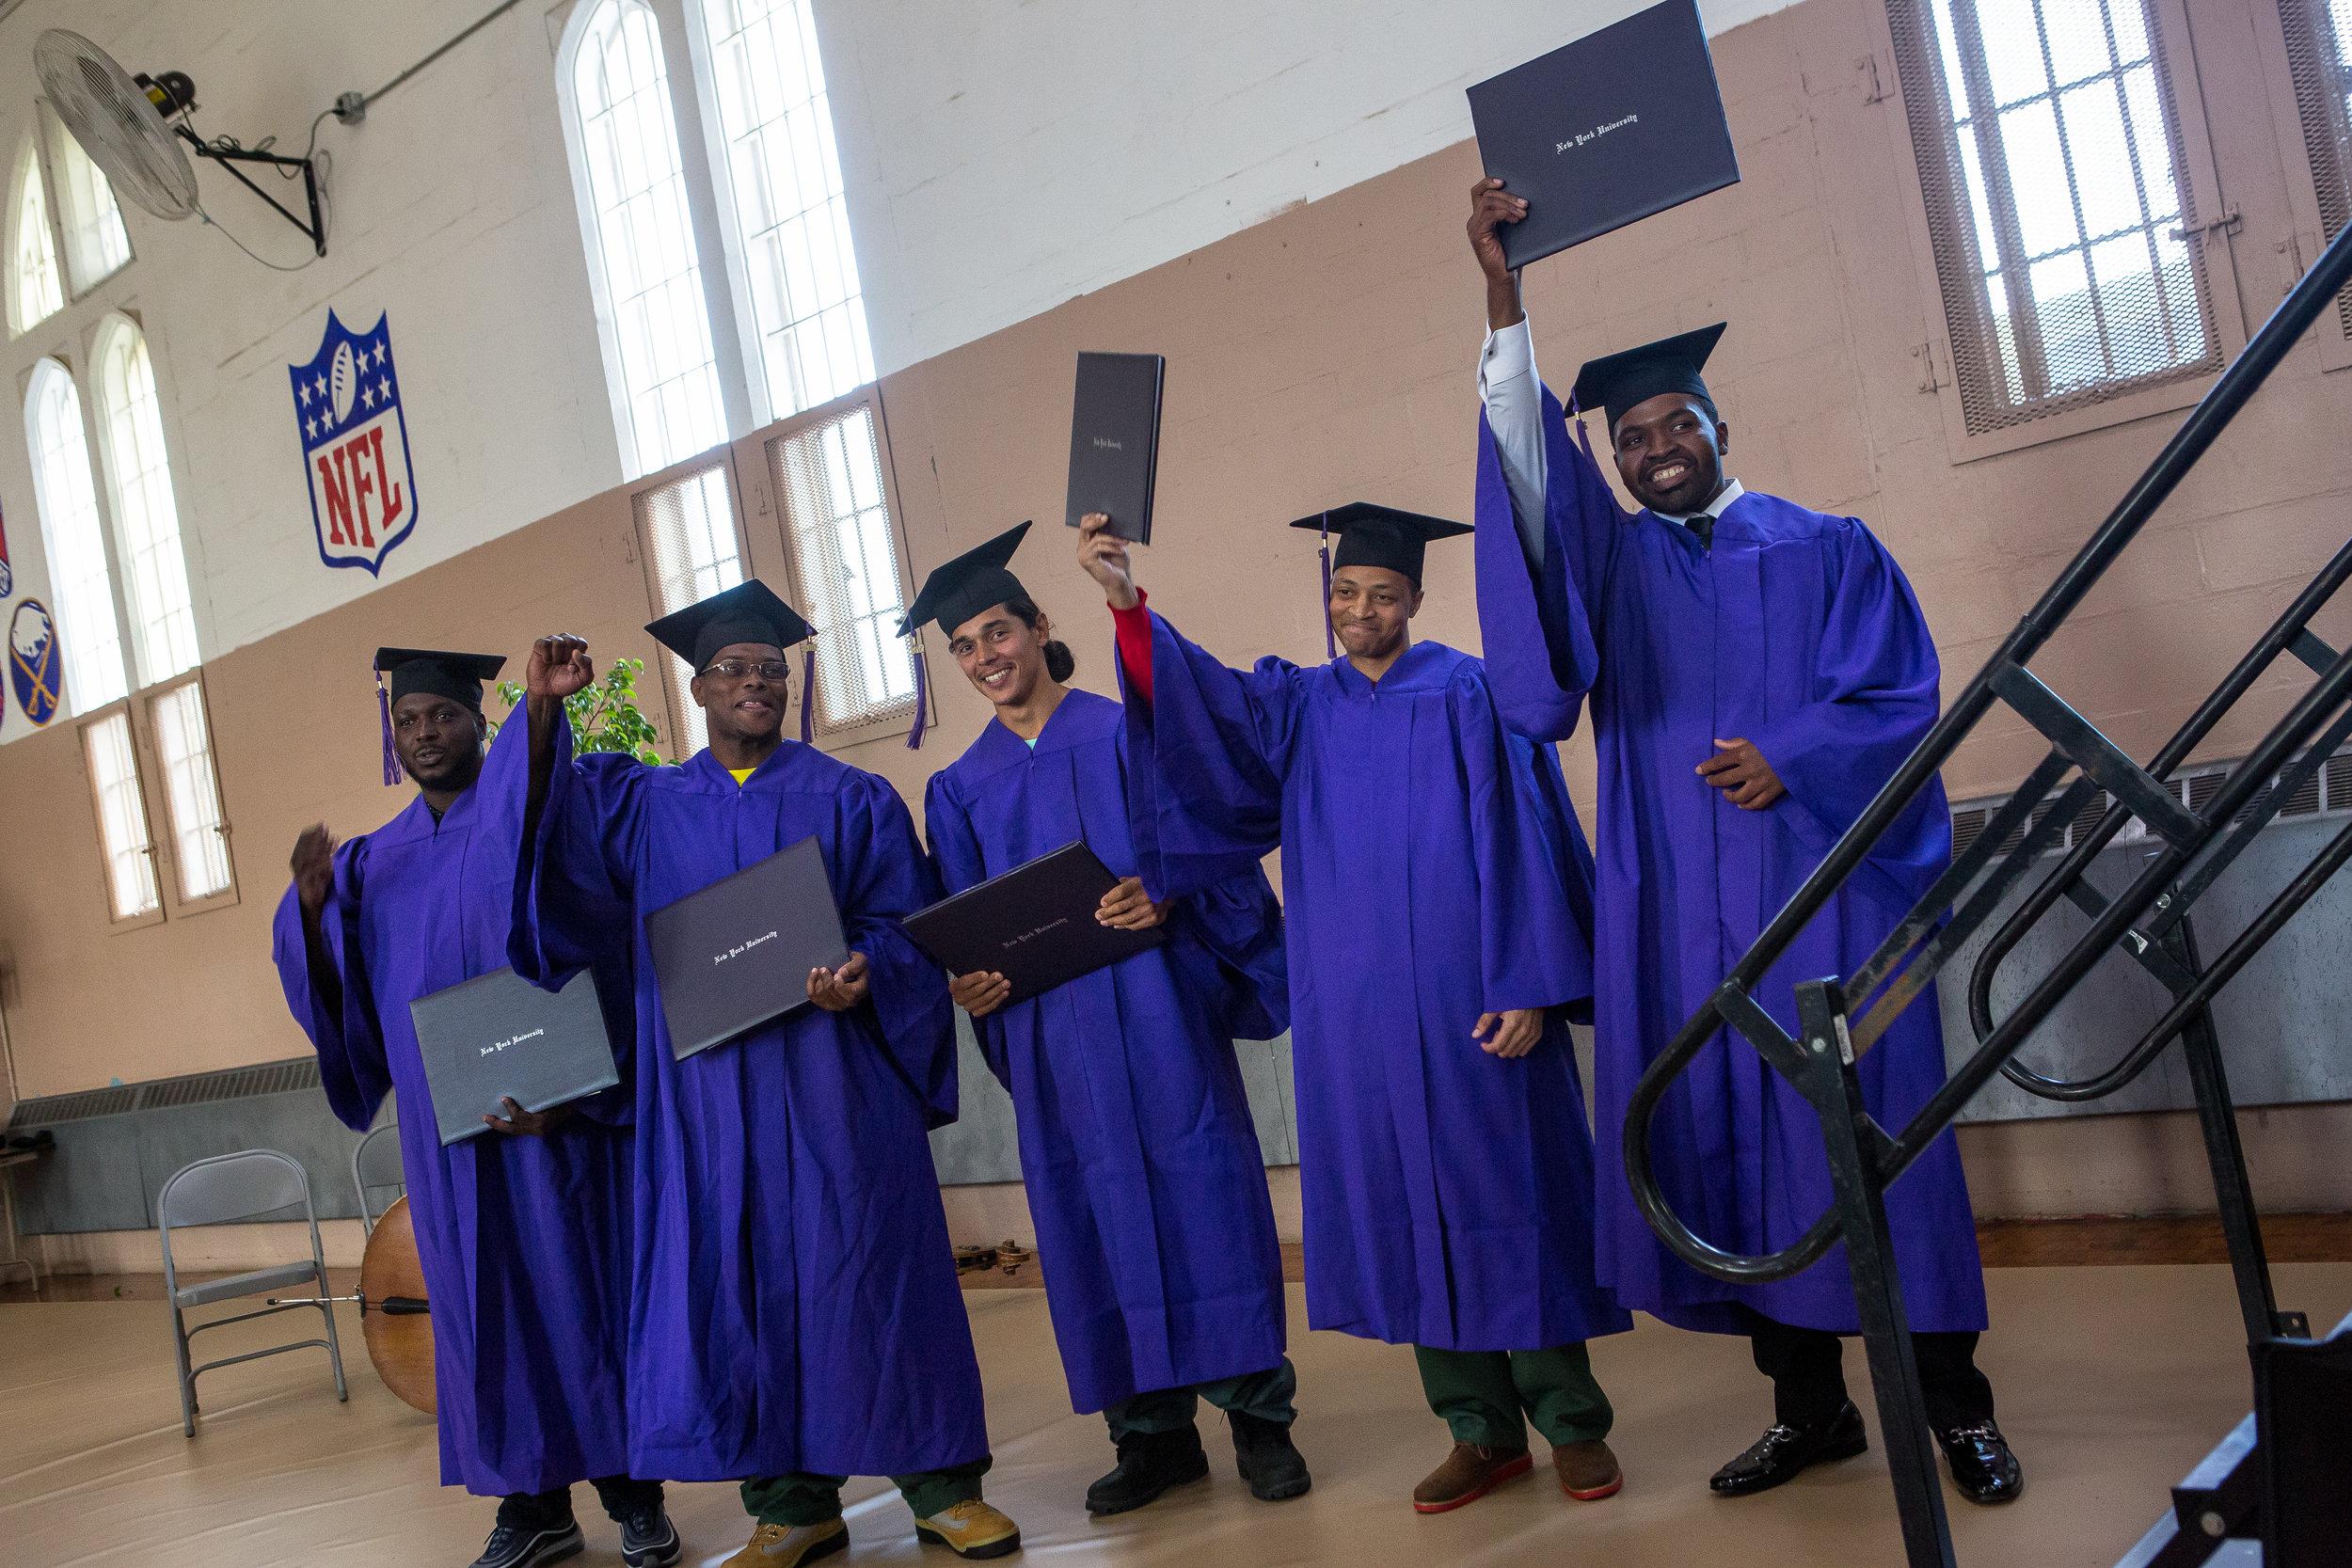 The graduates celebrate after receiving their diplomas.